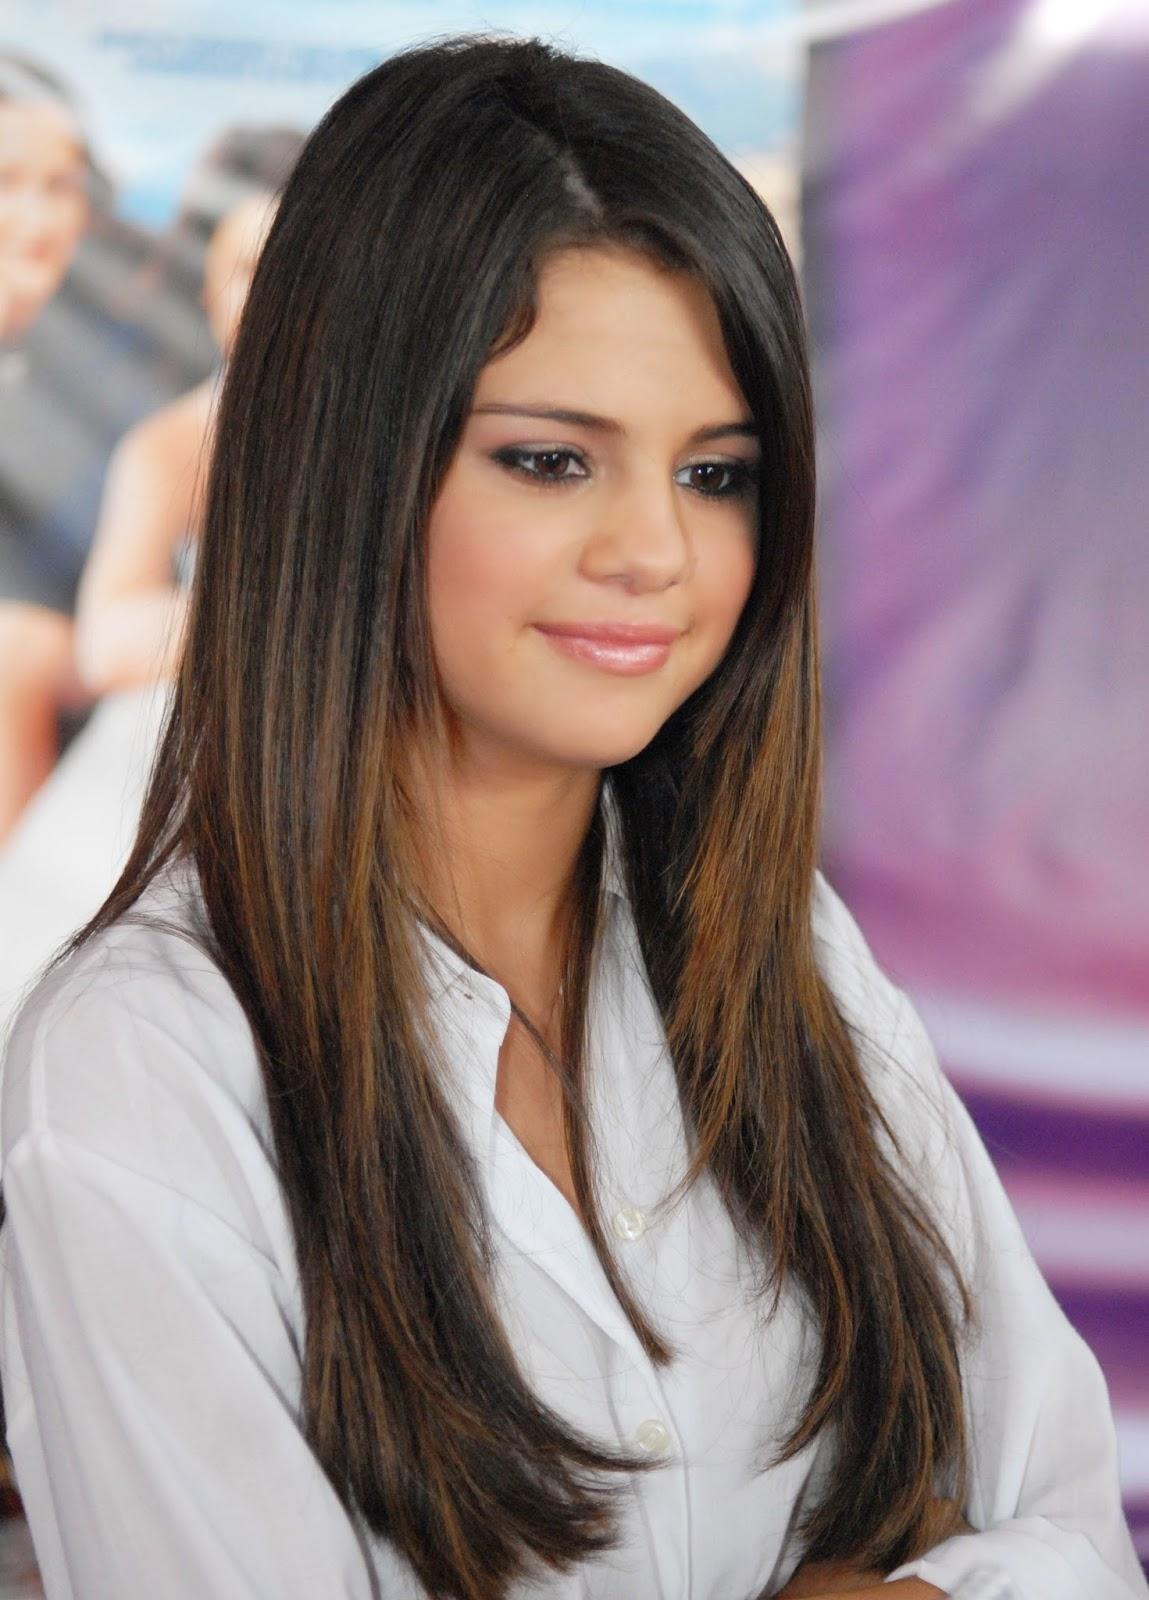 Celebrity Hairstyles: Celebrity Selena Gomez Hairstyles